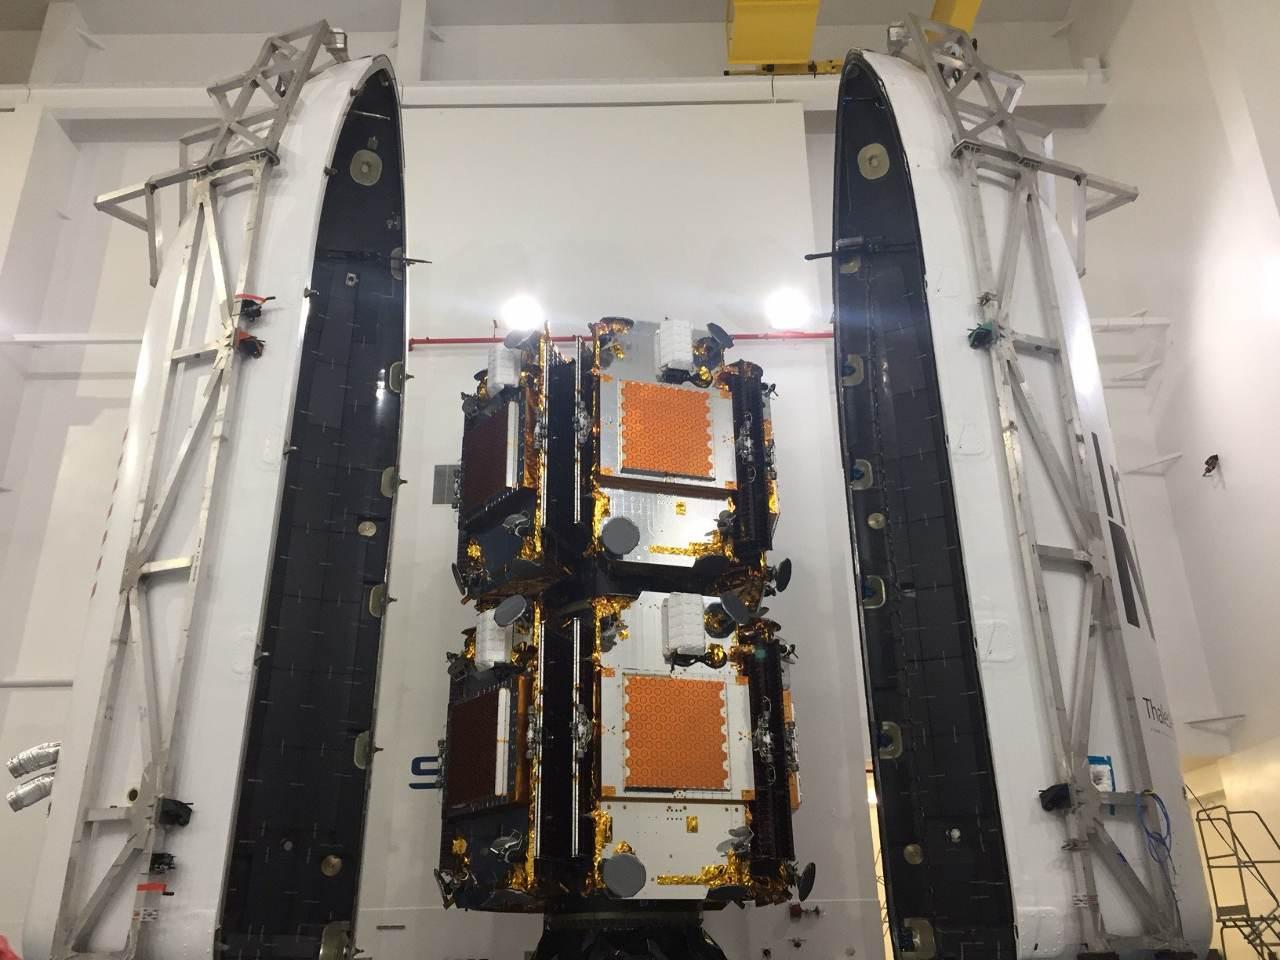 Troisième lot Iridium Next sur orbite